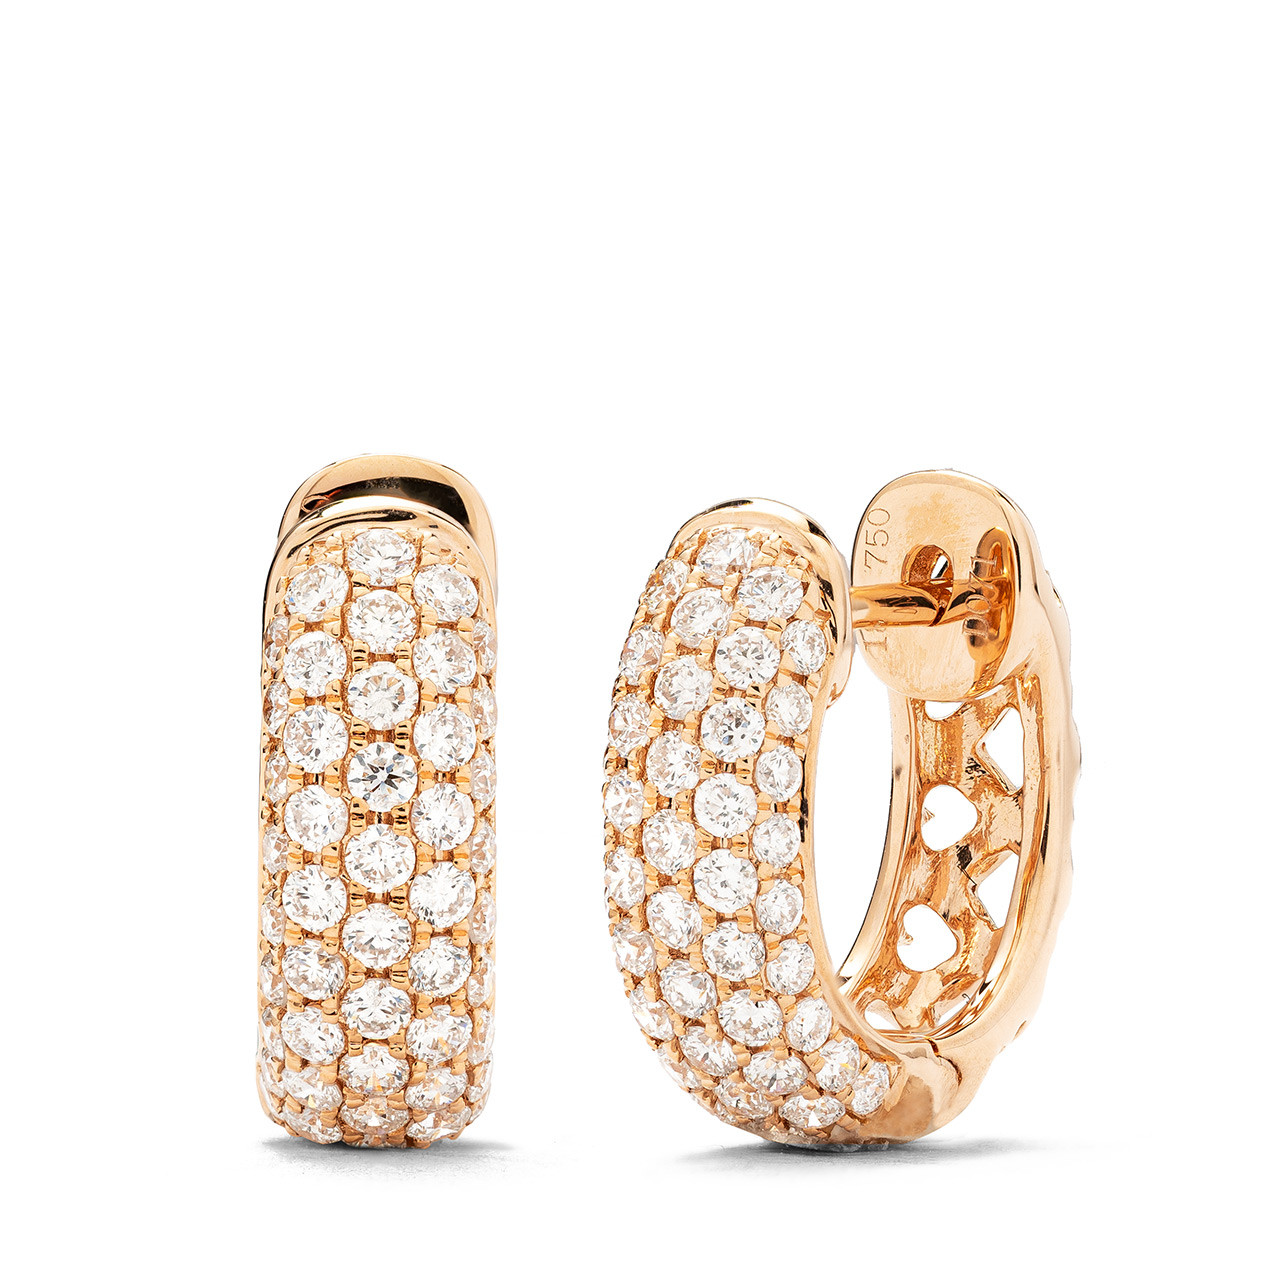 18k Rose Gold Diamond Hoop Earrings 71 Ctw Shyne Jewelers